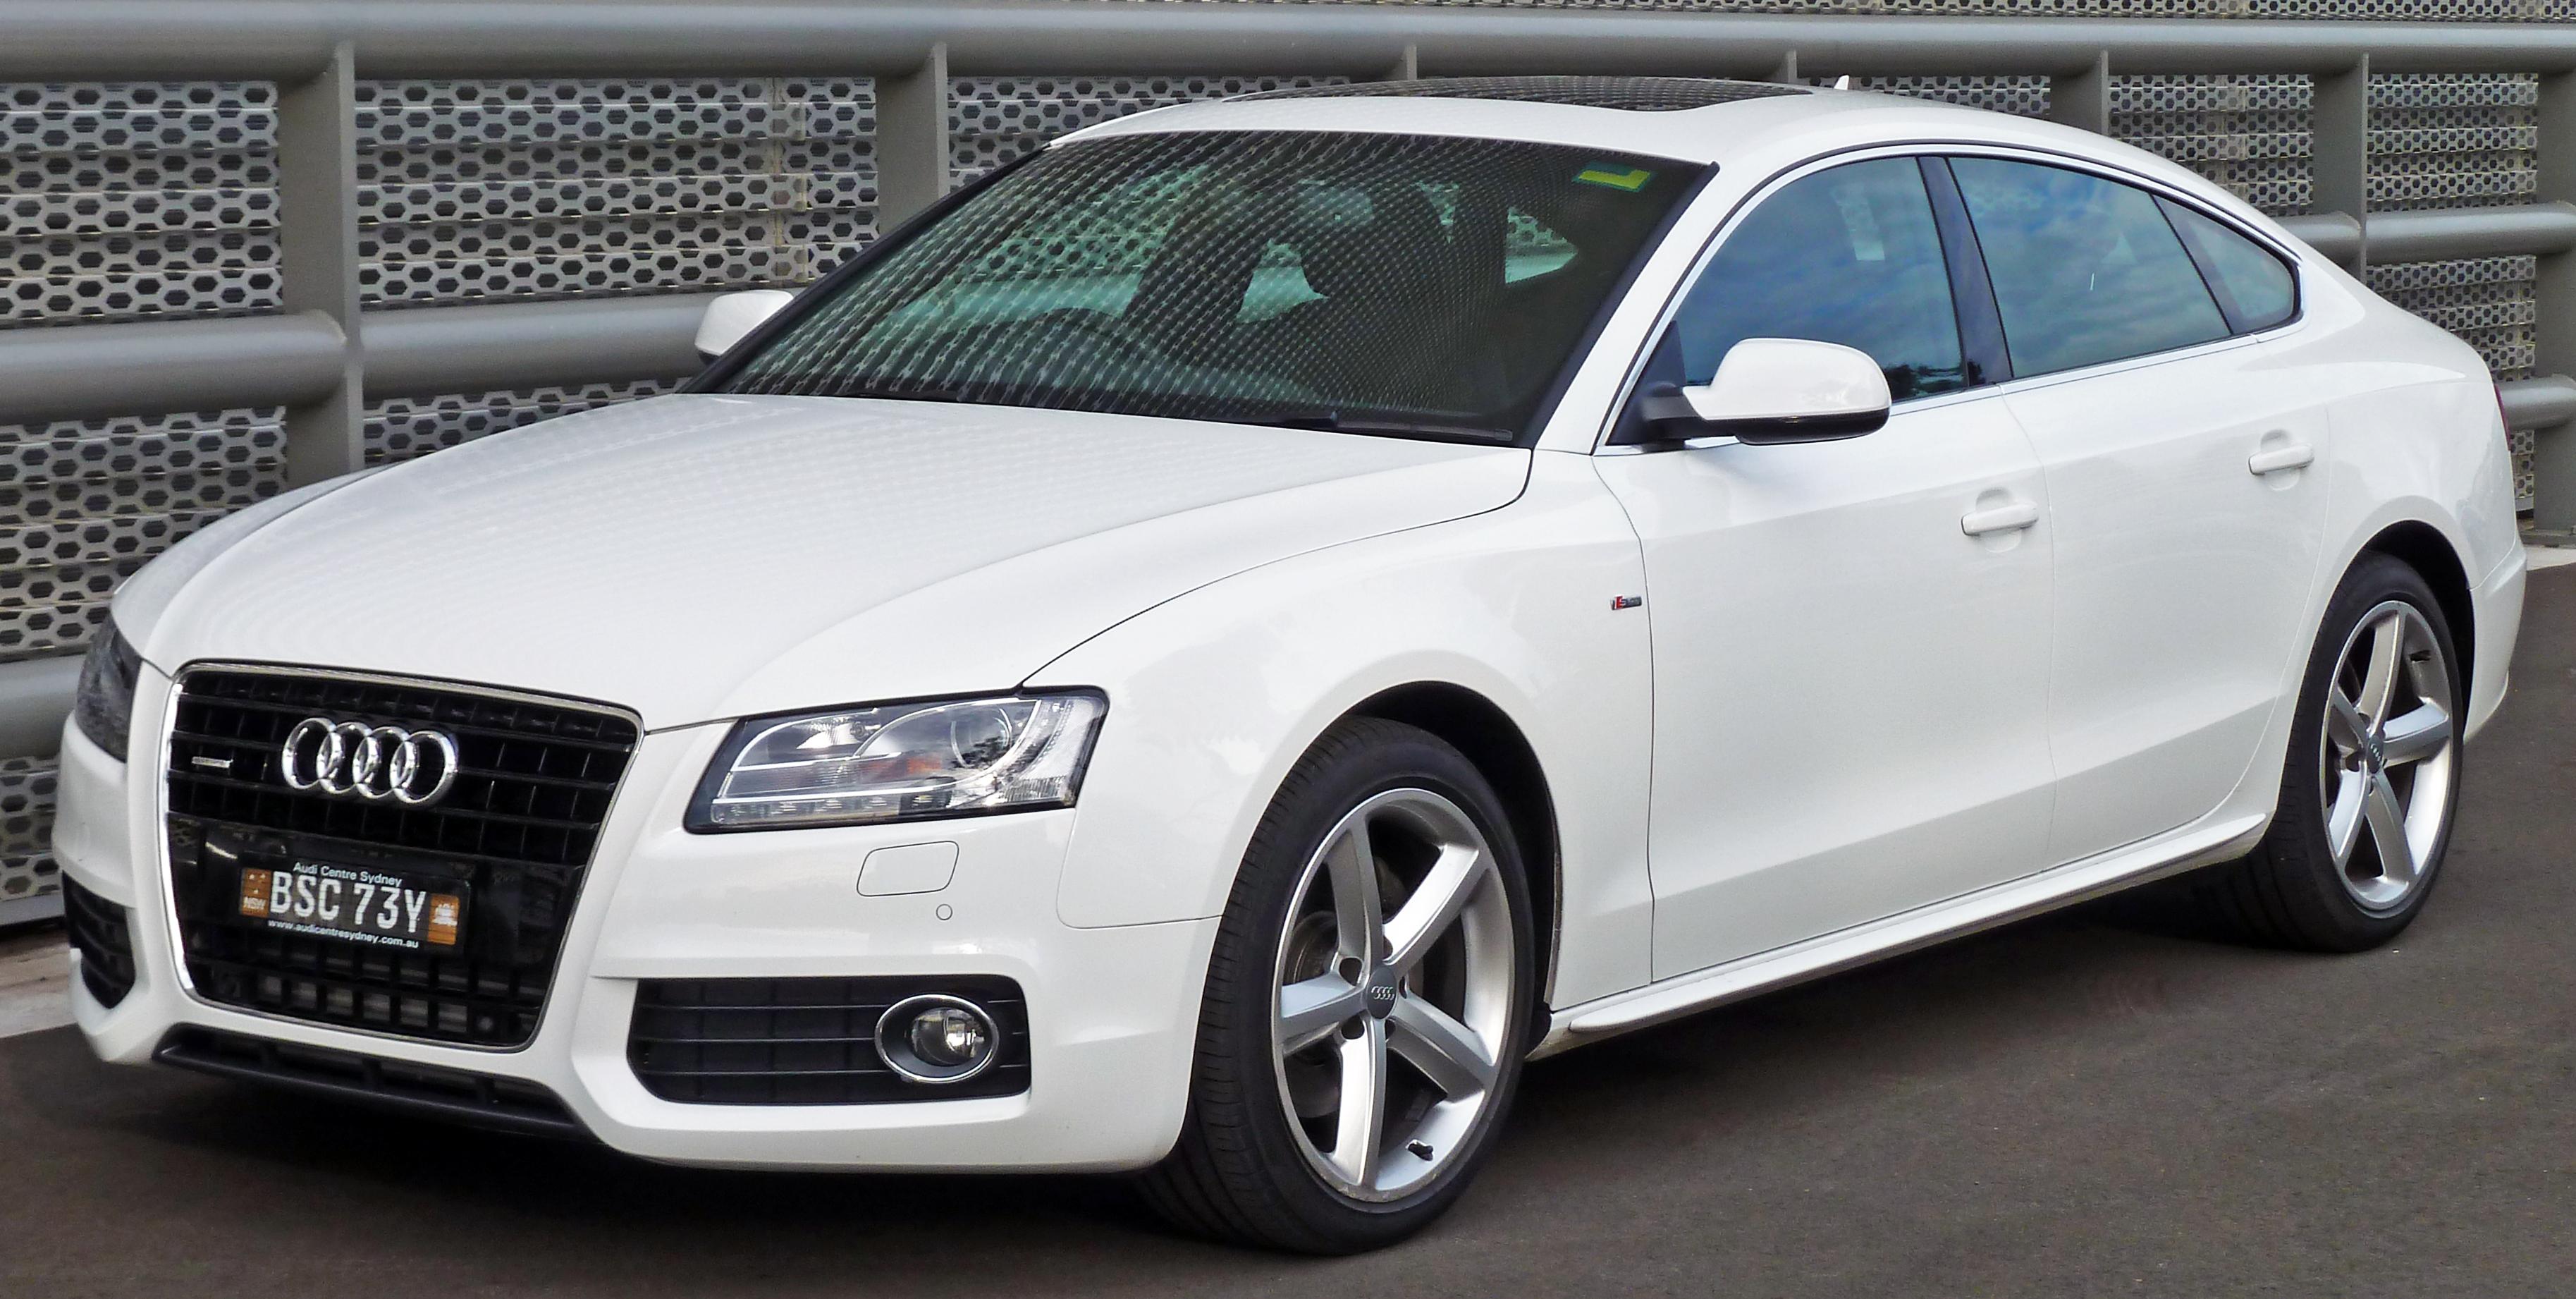 AUDI A Review And Photos - Audi 5